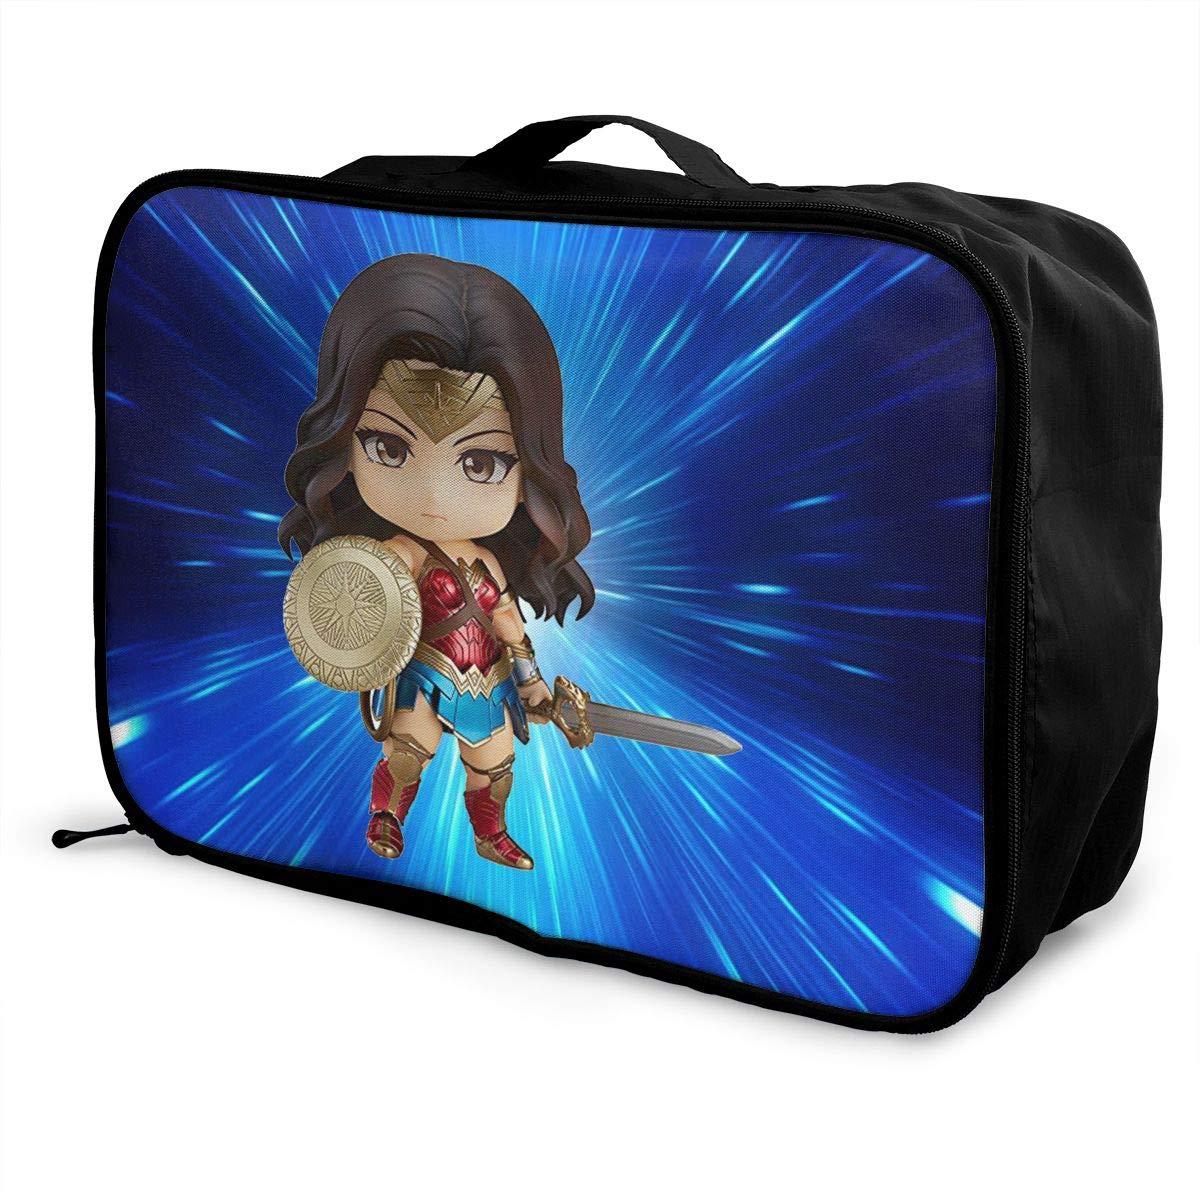 BOKAIKAI1306 Handsome Legend Zelda Unisex Adult Fashion Lightweight Large Capacity Portable Large Travel Duffel Bag Men Womens Luggage Bag 3D Printed Customized Boarding Box